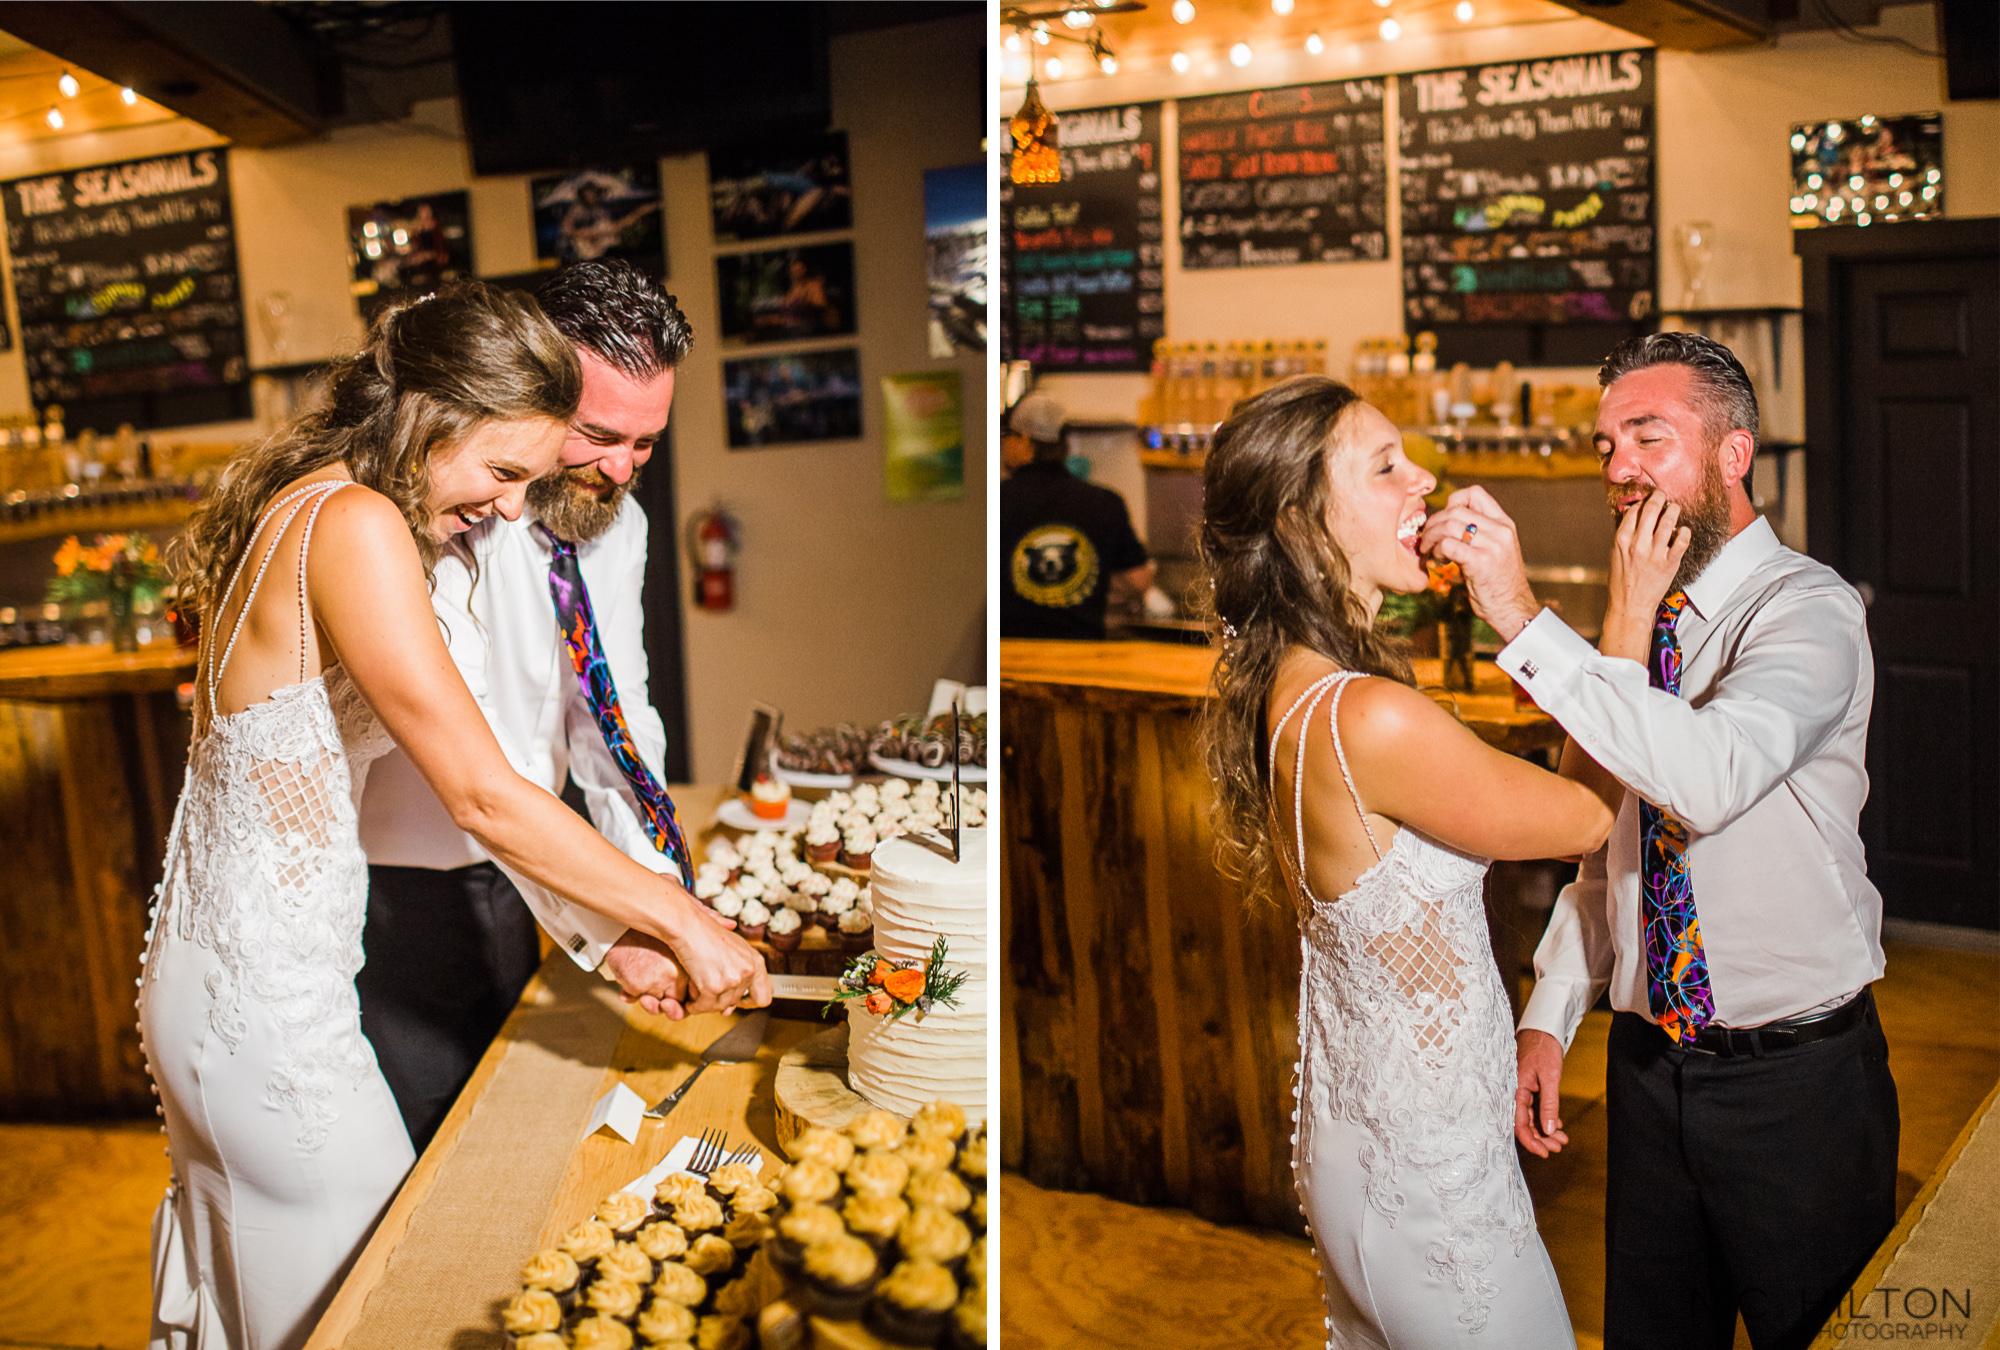 Cake-cutting-mammoth-brewery-reception.jpg